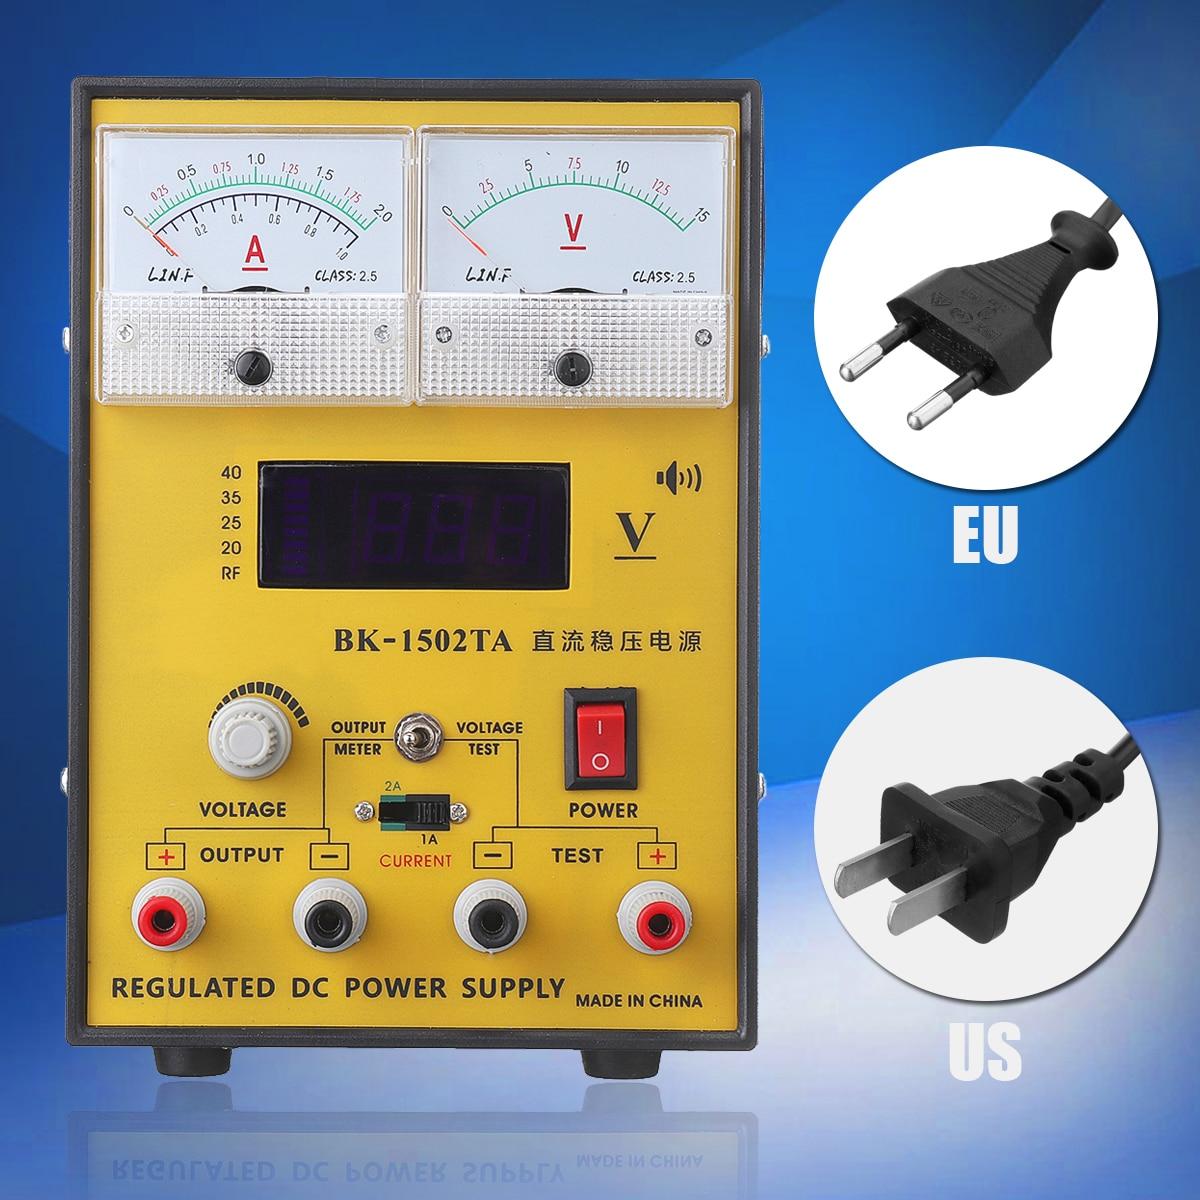 110V/220V 15V 2A Portable Digital LED DC Power Supply Adjustable Regulator EU Plug/US Plug Power Supply rps3020d 2 digital dc power adjustable power 30v 20a power supply linear power notebook maintenance